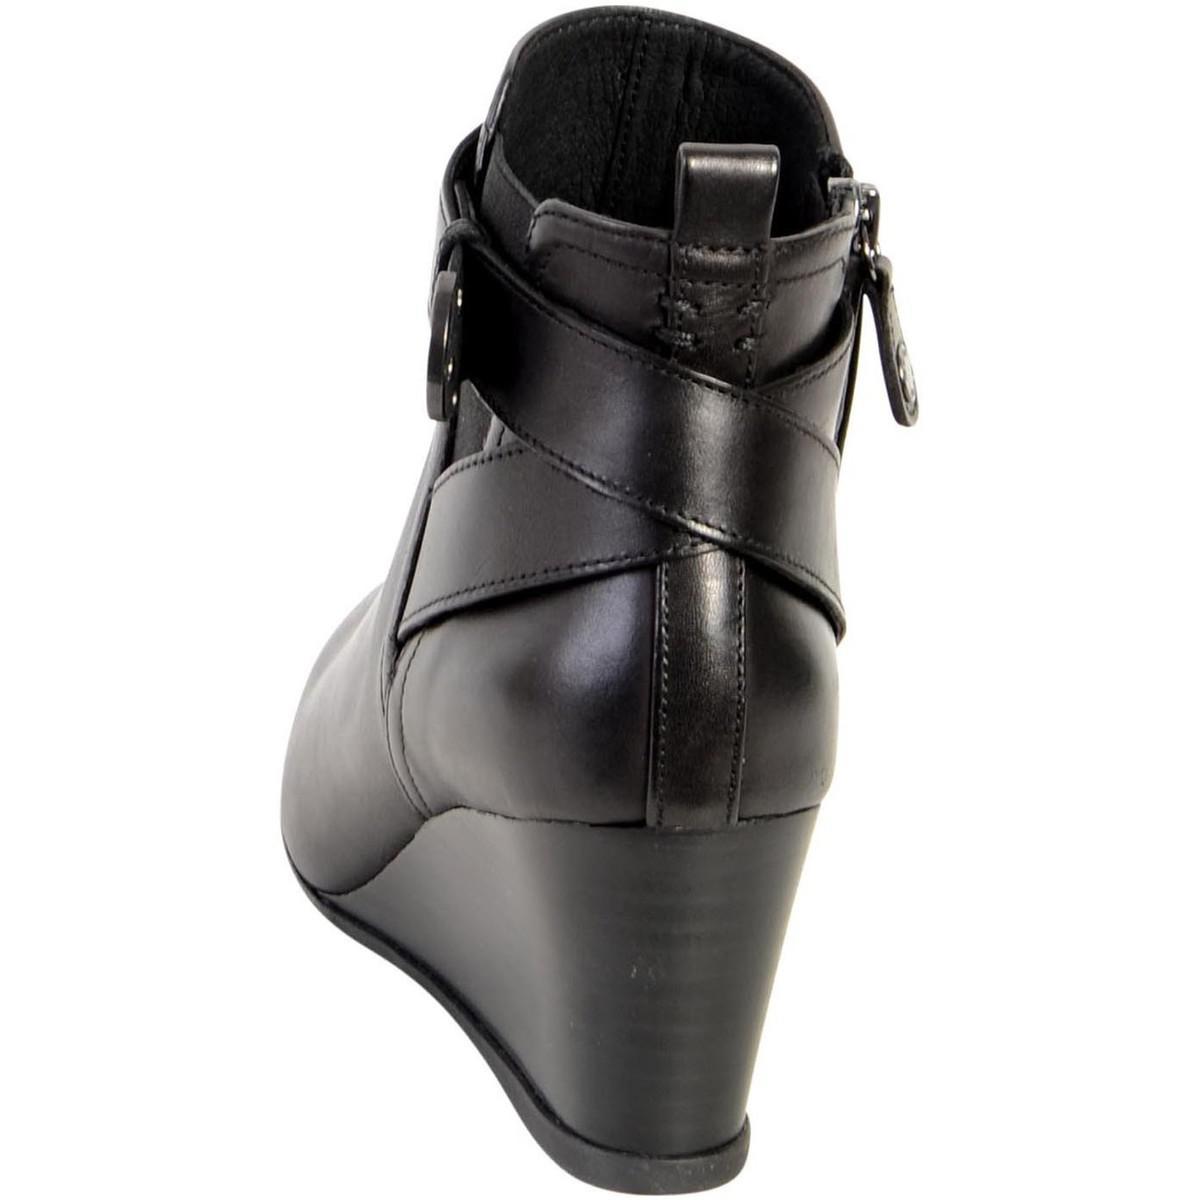 0f9f53413583 Geox Boots D Inspiration Wedge D745zd 00043 C9999 Black Women s Low ...